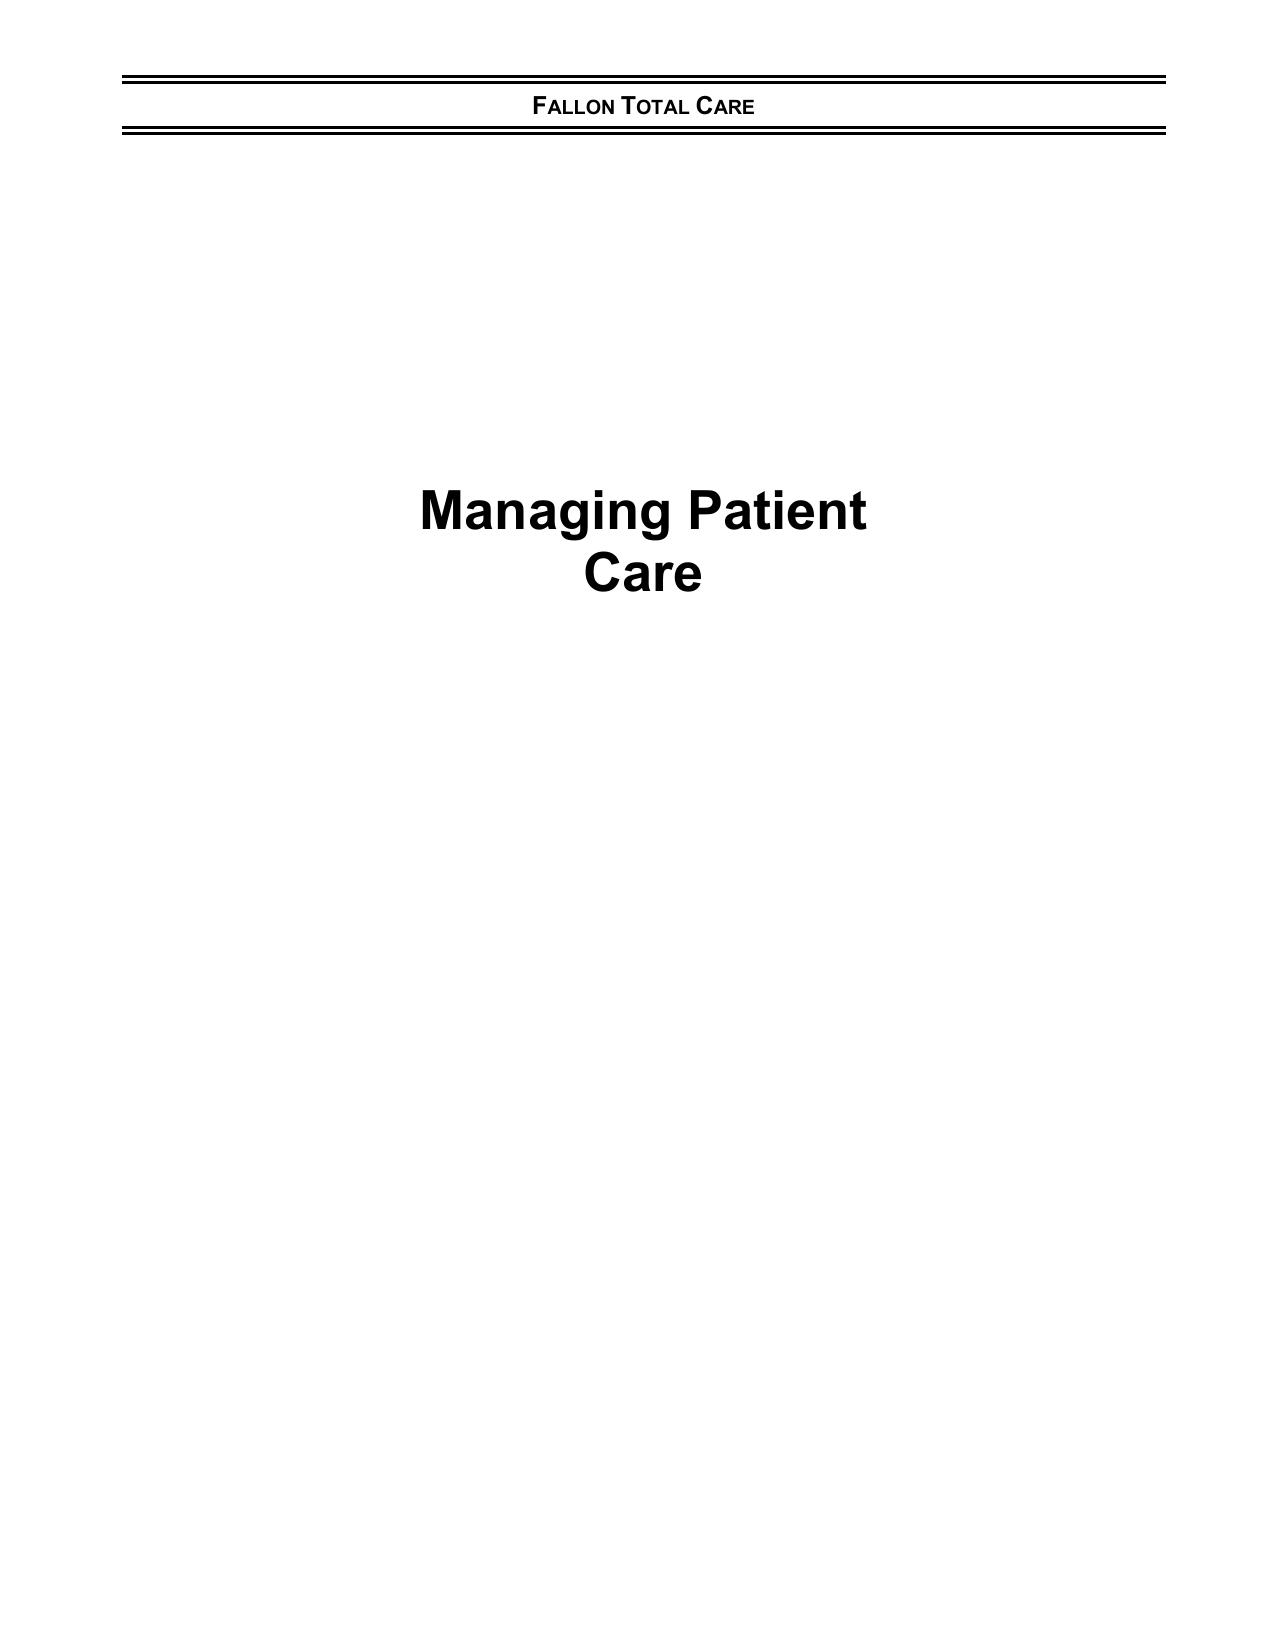 Managing Patient Care - FCHP Provider Manual | manualzz com